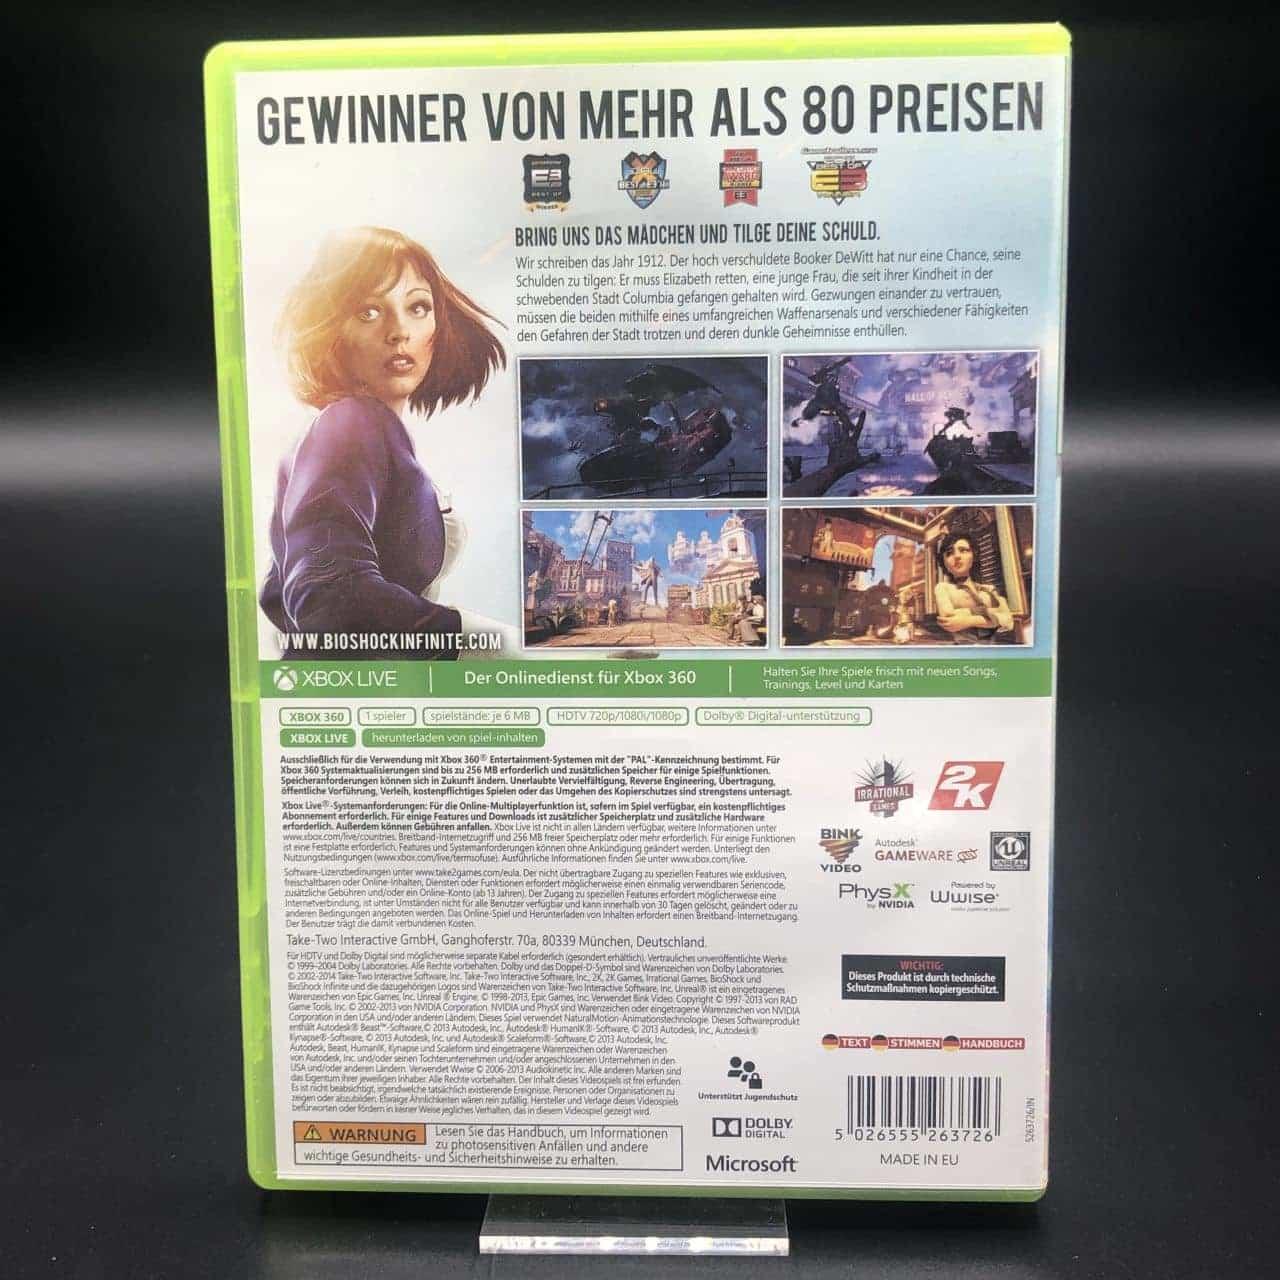 BioShock Infinite (Classics) (Komplett) (Sehr gut) XBOX 360 (FSK18)